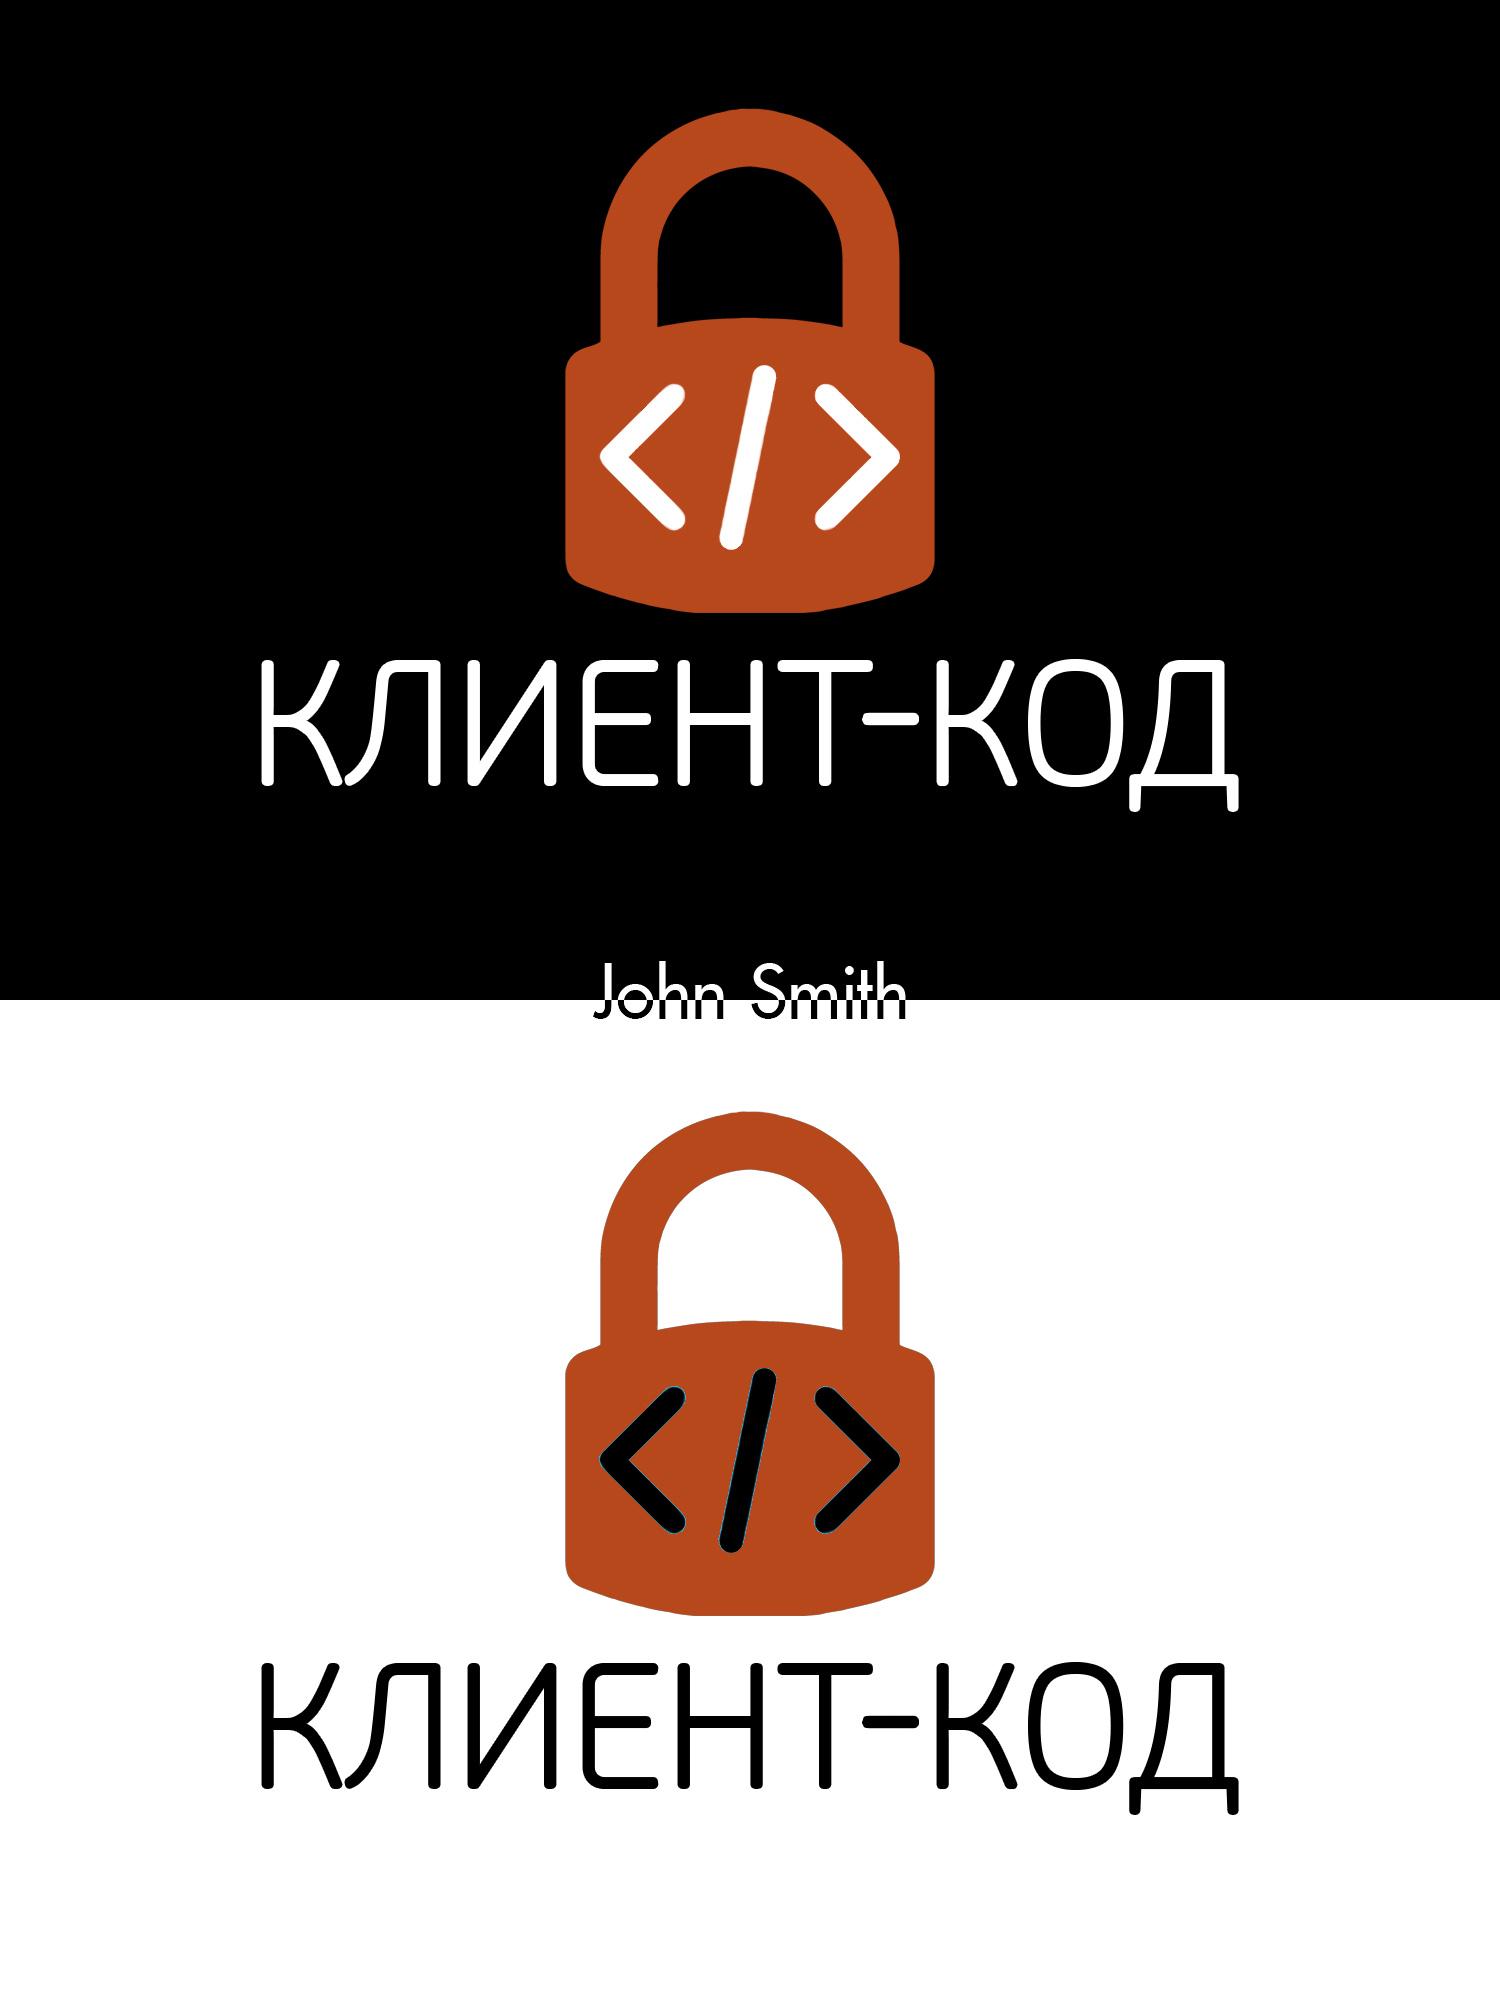 Нейминг и логотип компании, занимающейся аутсорсингом фото f_00259d68a0873186.jpg